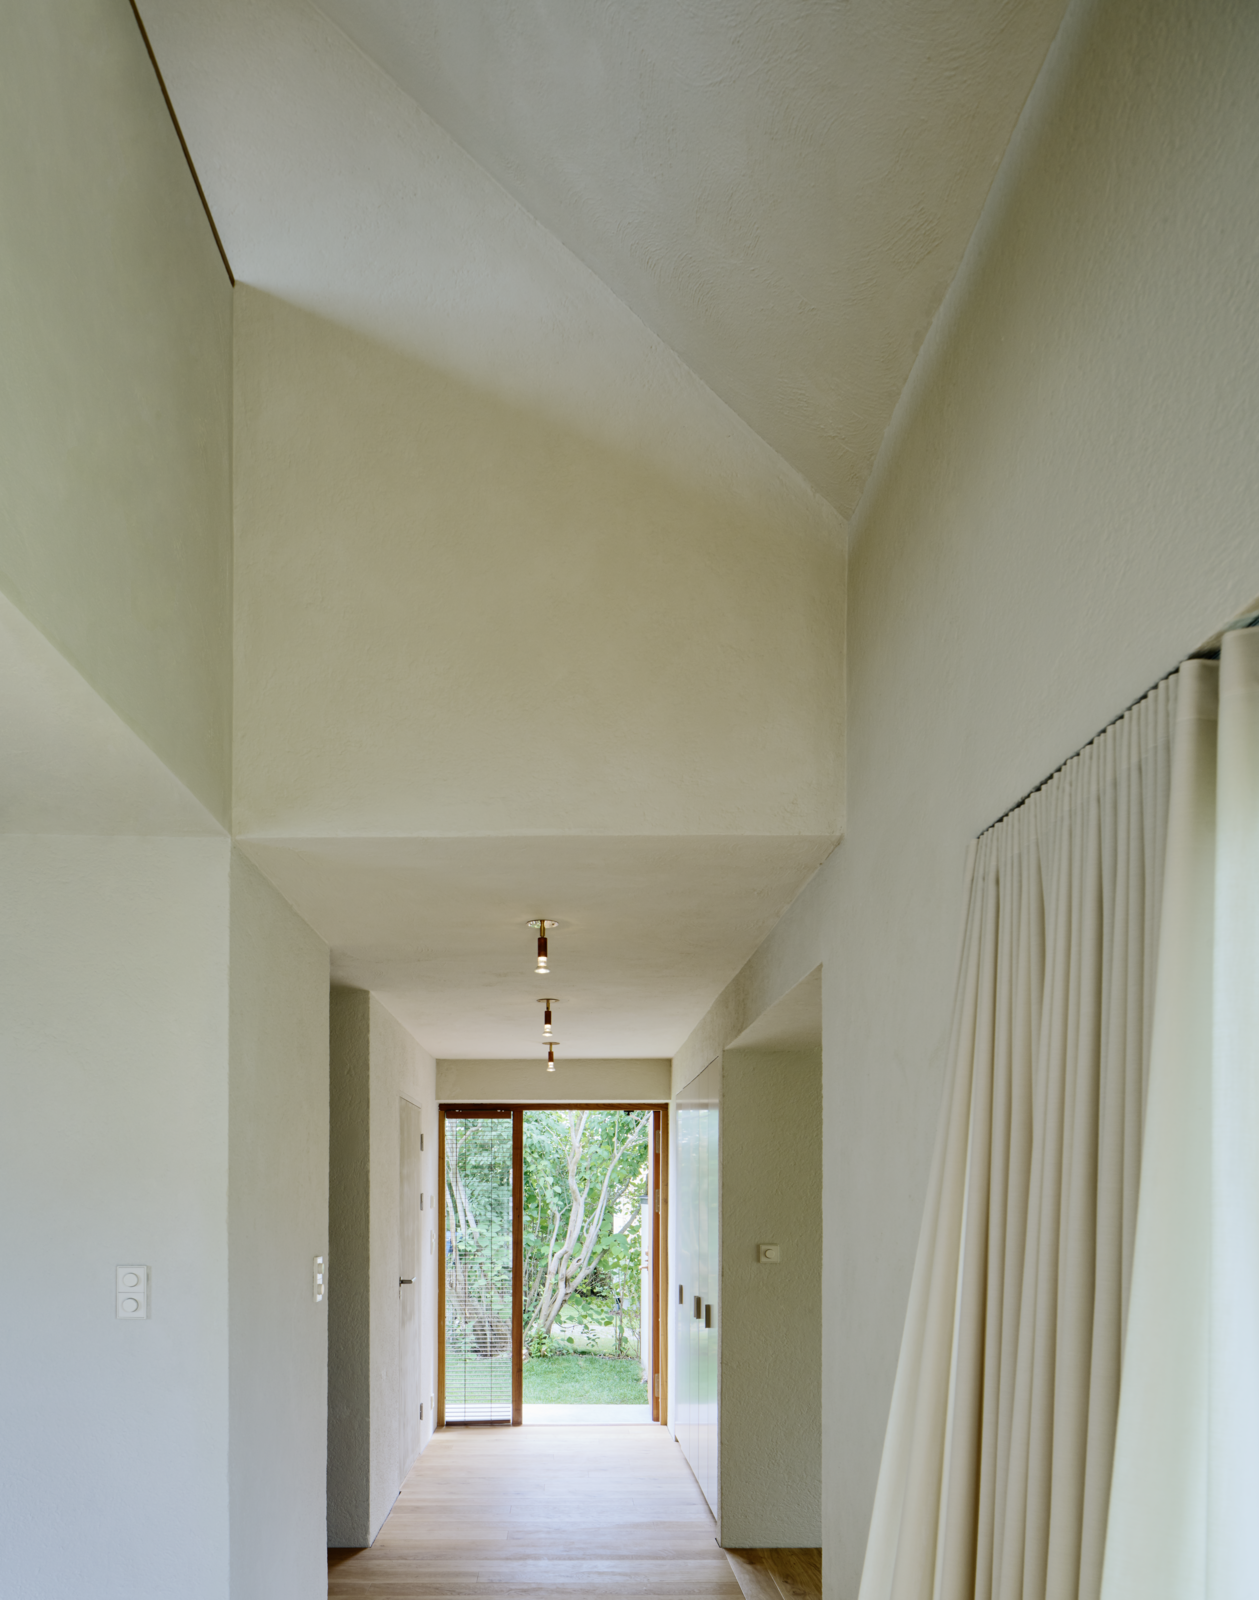 Tagged: Hallway and Medium Hardwood Floor. Sleek Scandinavian Design Permeates a Family's Summer House in an Old Fishing Village - Photo 5 of 12